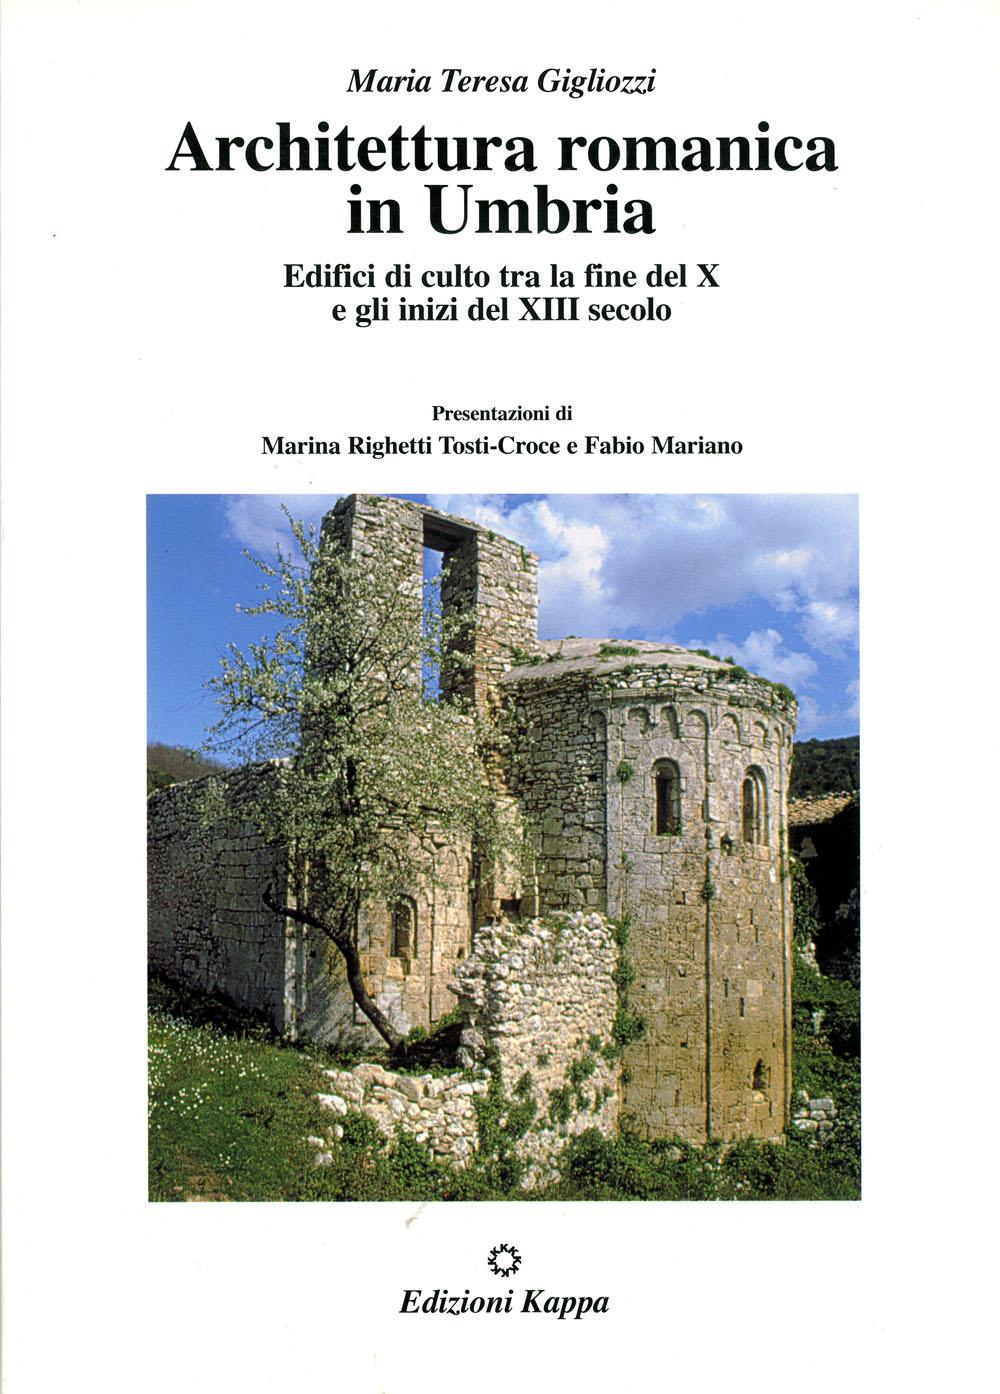 Architettura romanica in Umbria